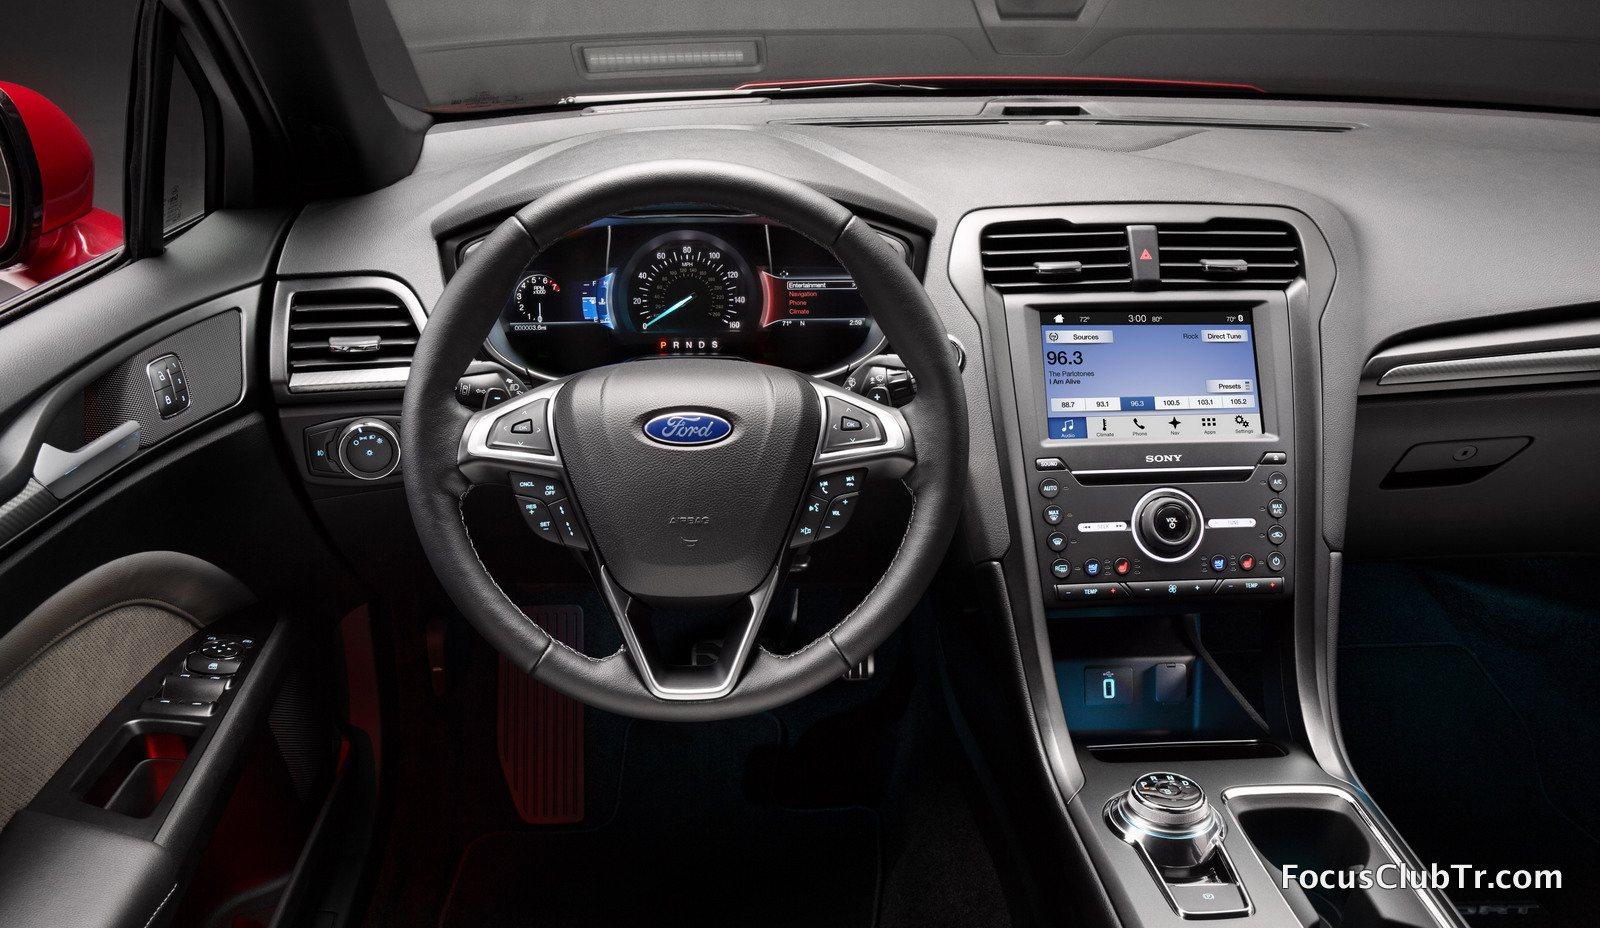 новый форд мондео 2017 года фото